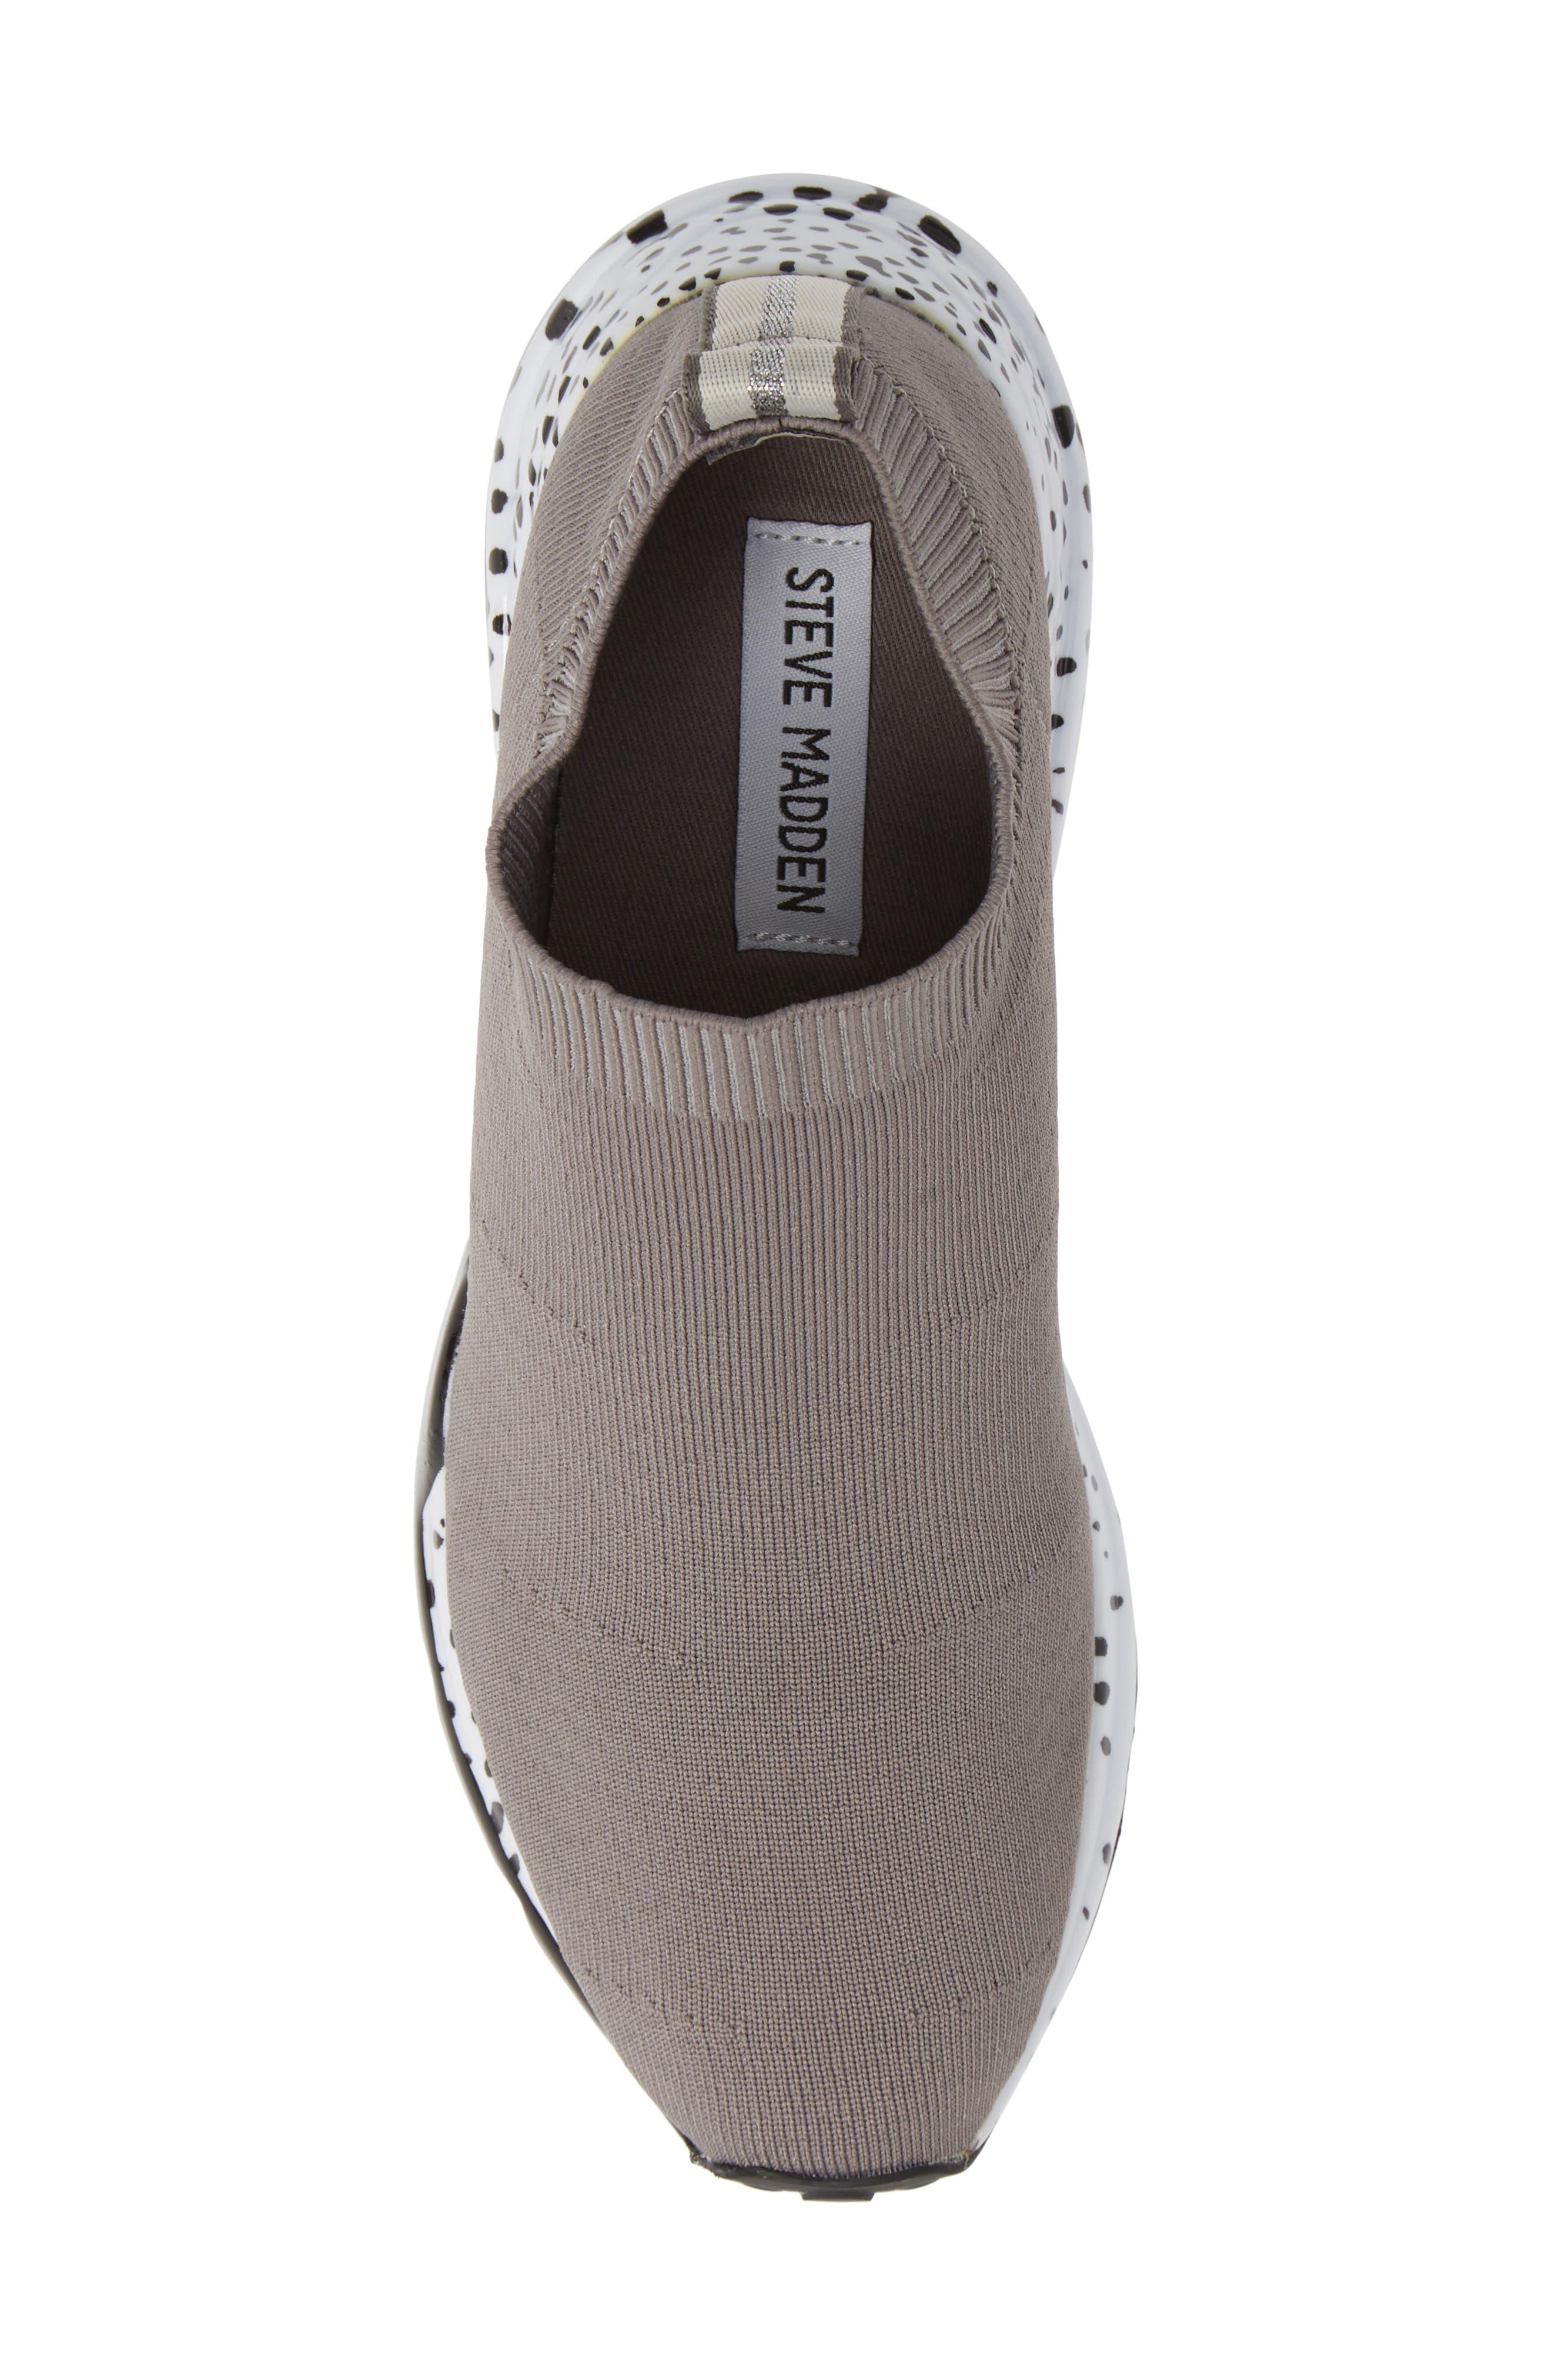 Cloud Sock Wedge Sneaker,                             Alternate thumbnail 5, color,                             GREY